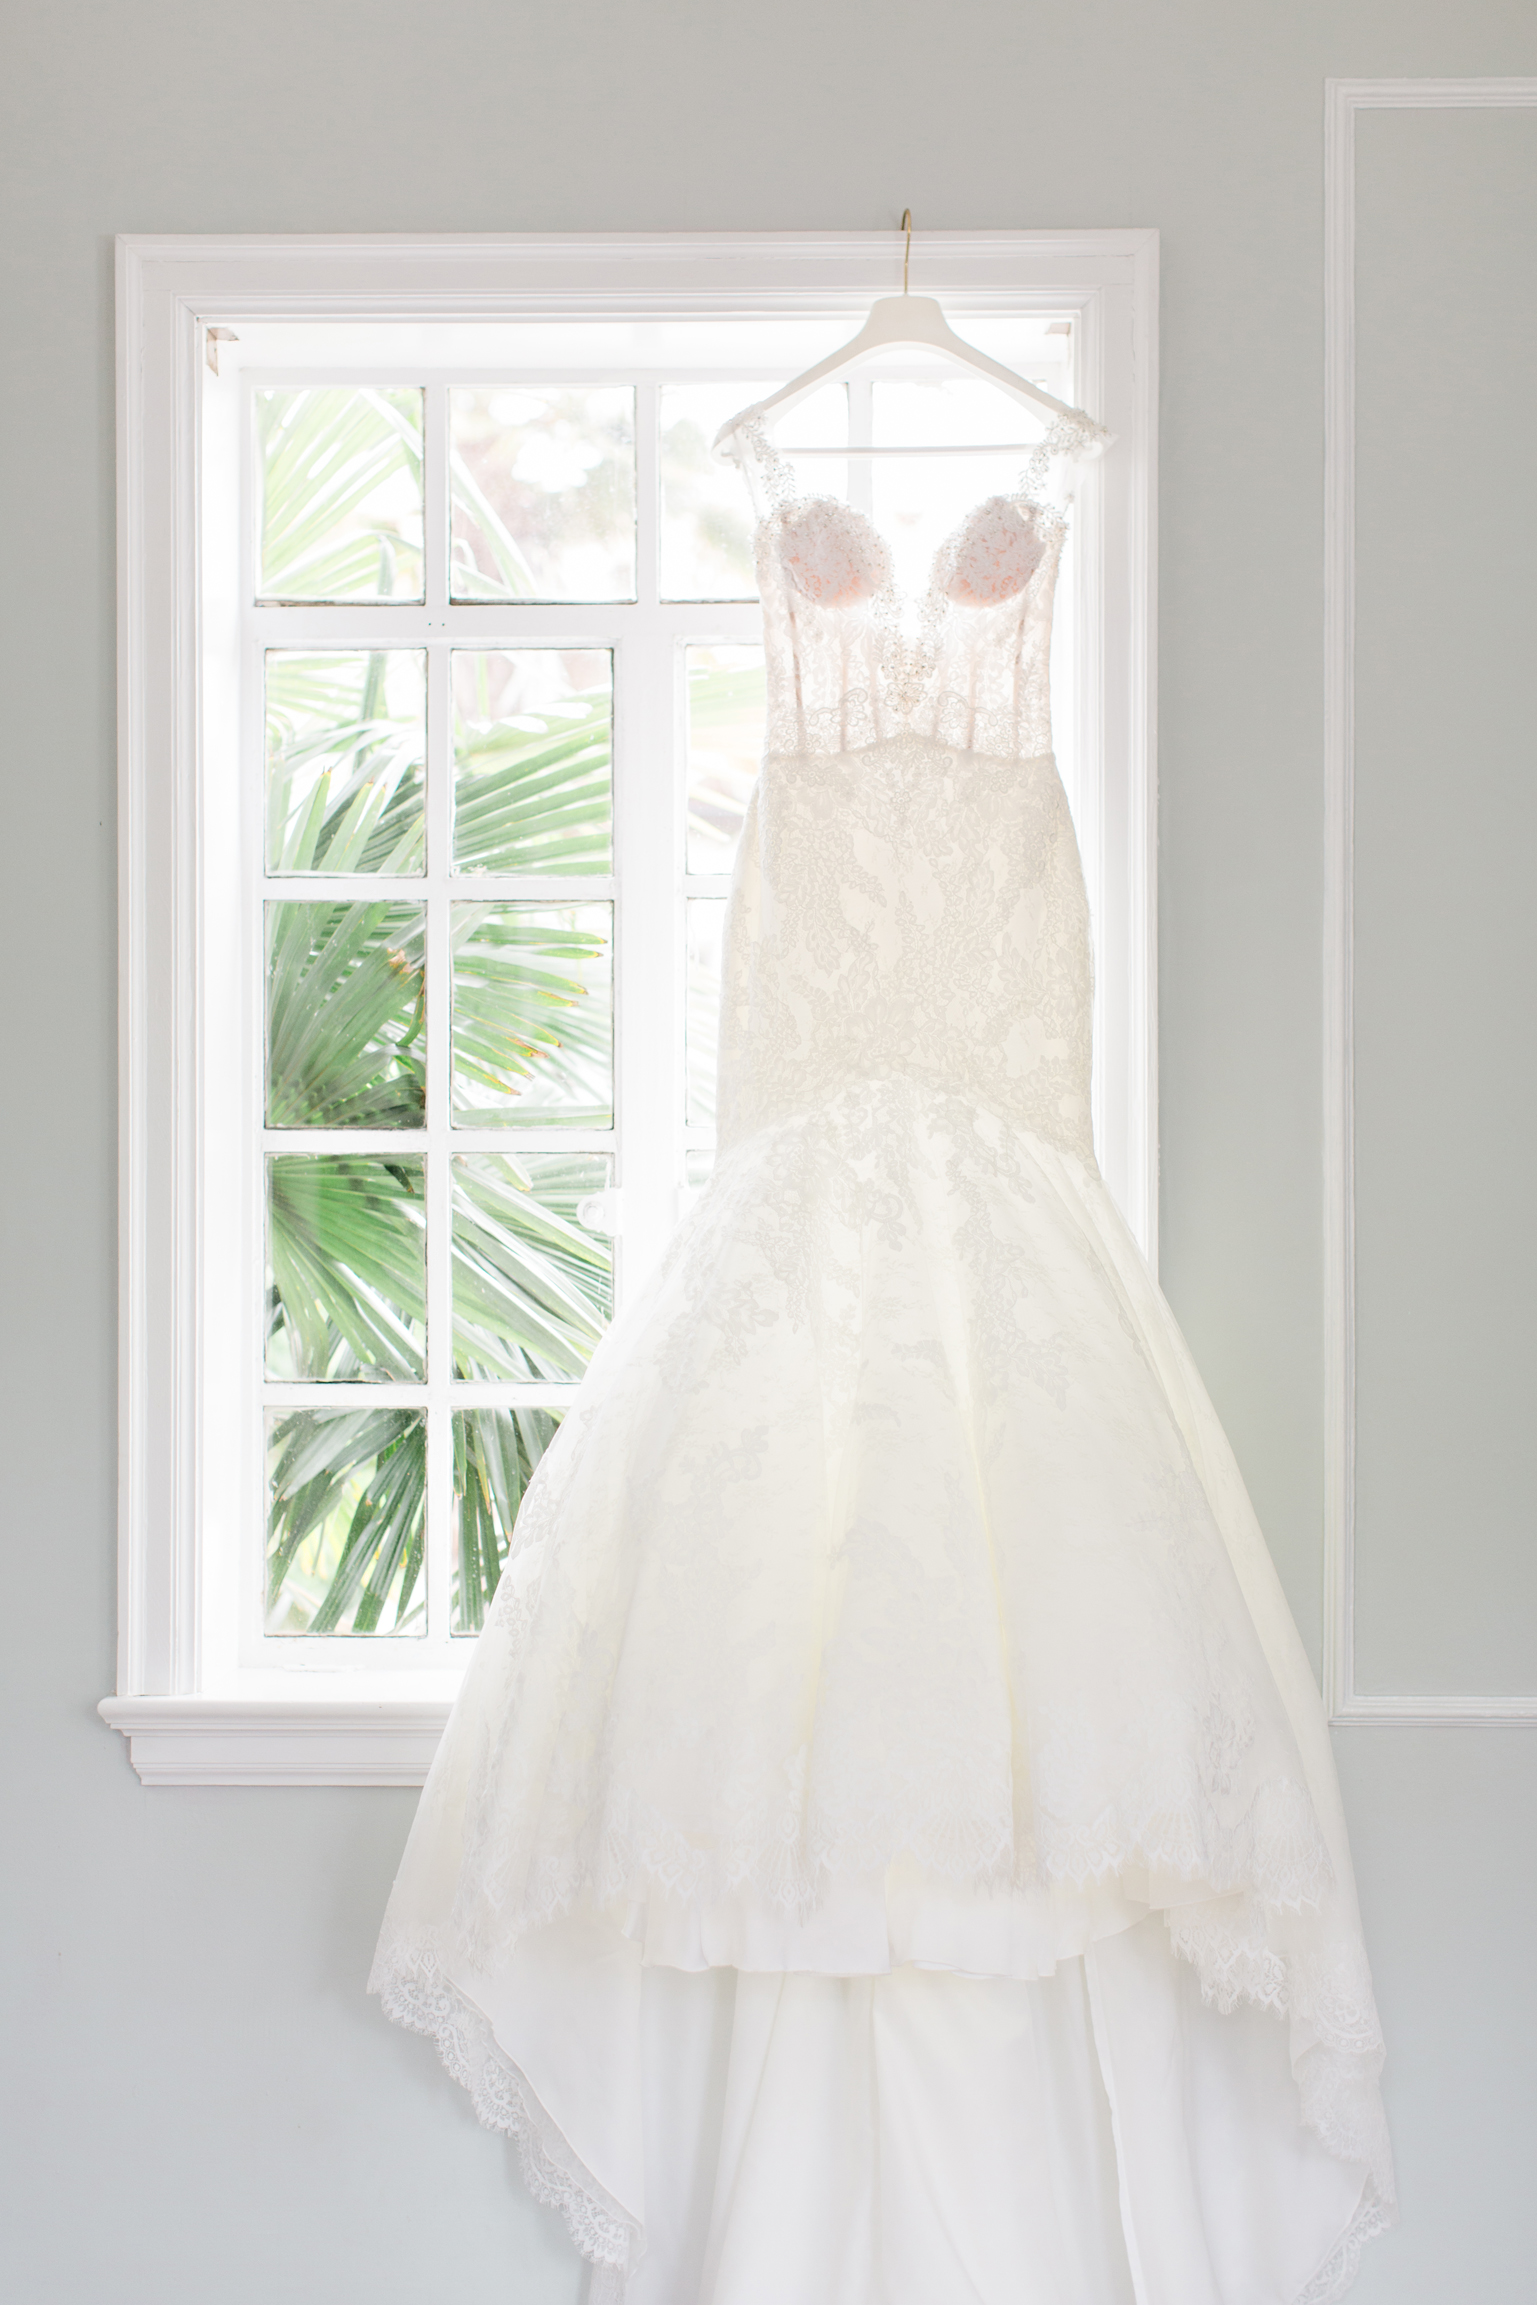 Matty-Drollette-Montgomery-Alabama-Wedding-Photography-100.jpg